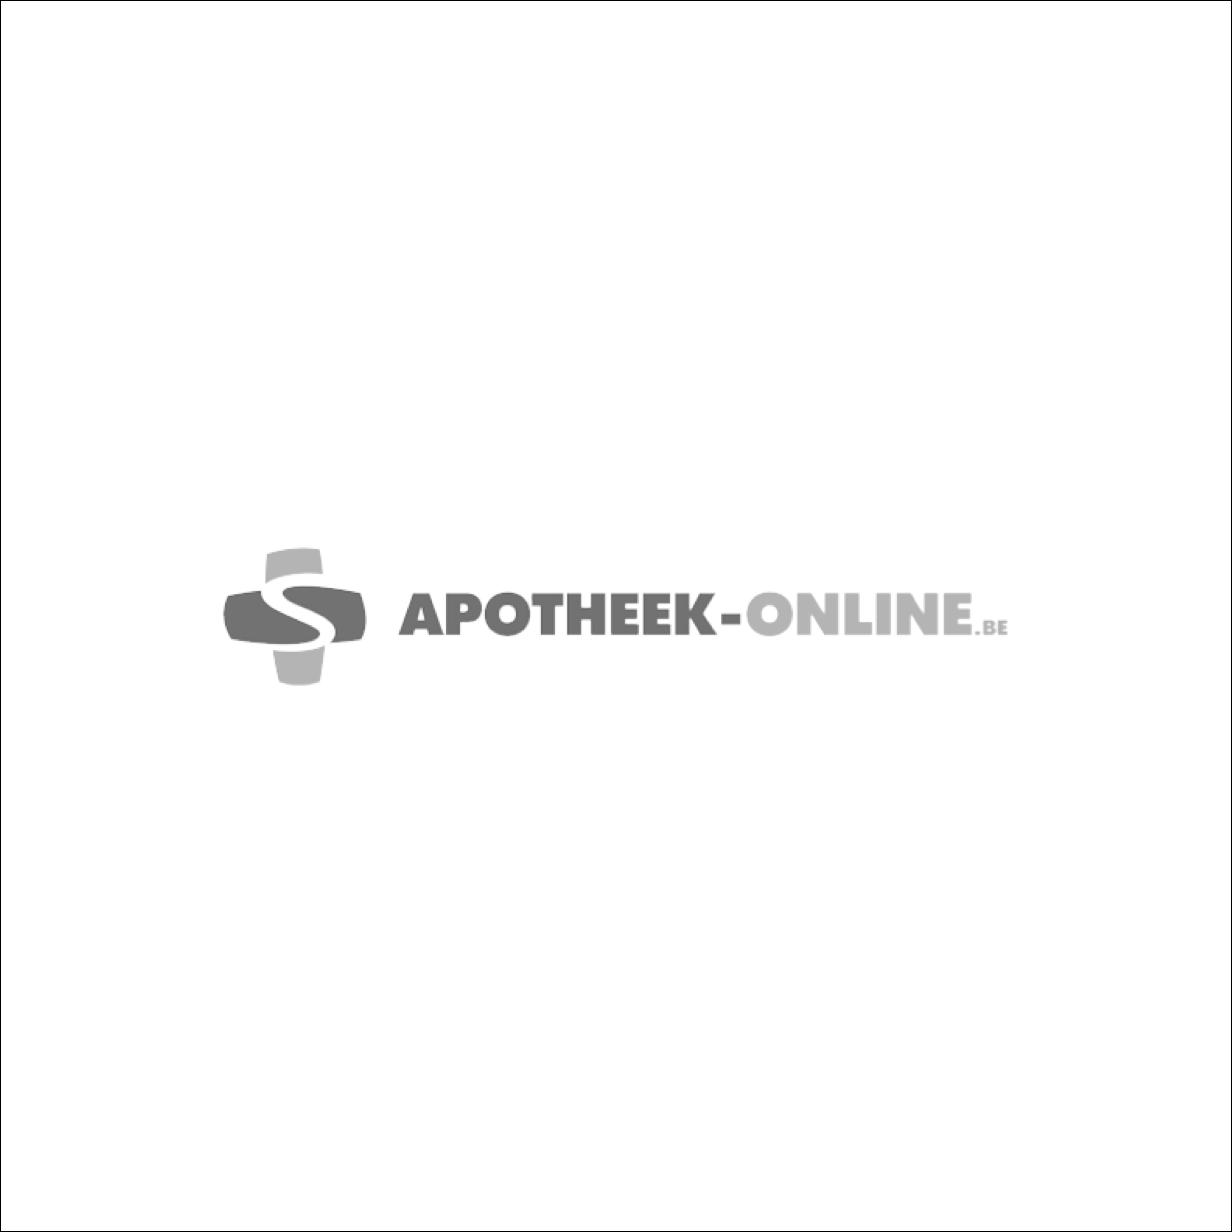 Mesoft S Kp N/st 4l 7,5x 7,5cm 100 157100